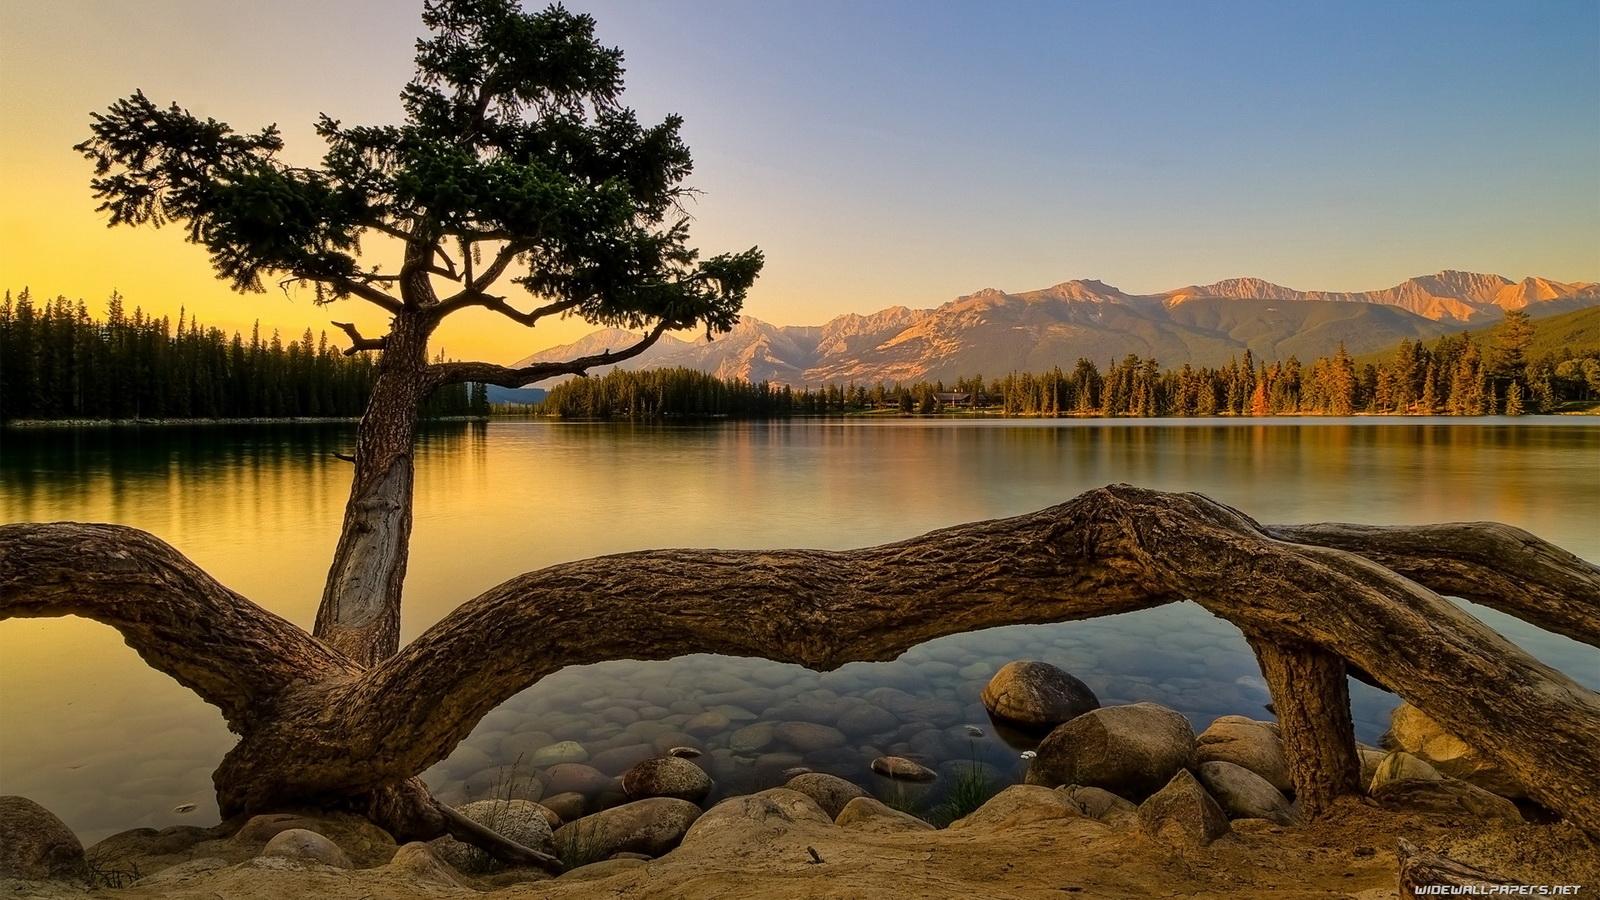 Daniel Sierra 3d Nature Hd Nature Wallpapers for Desktop 1600x900